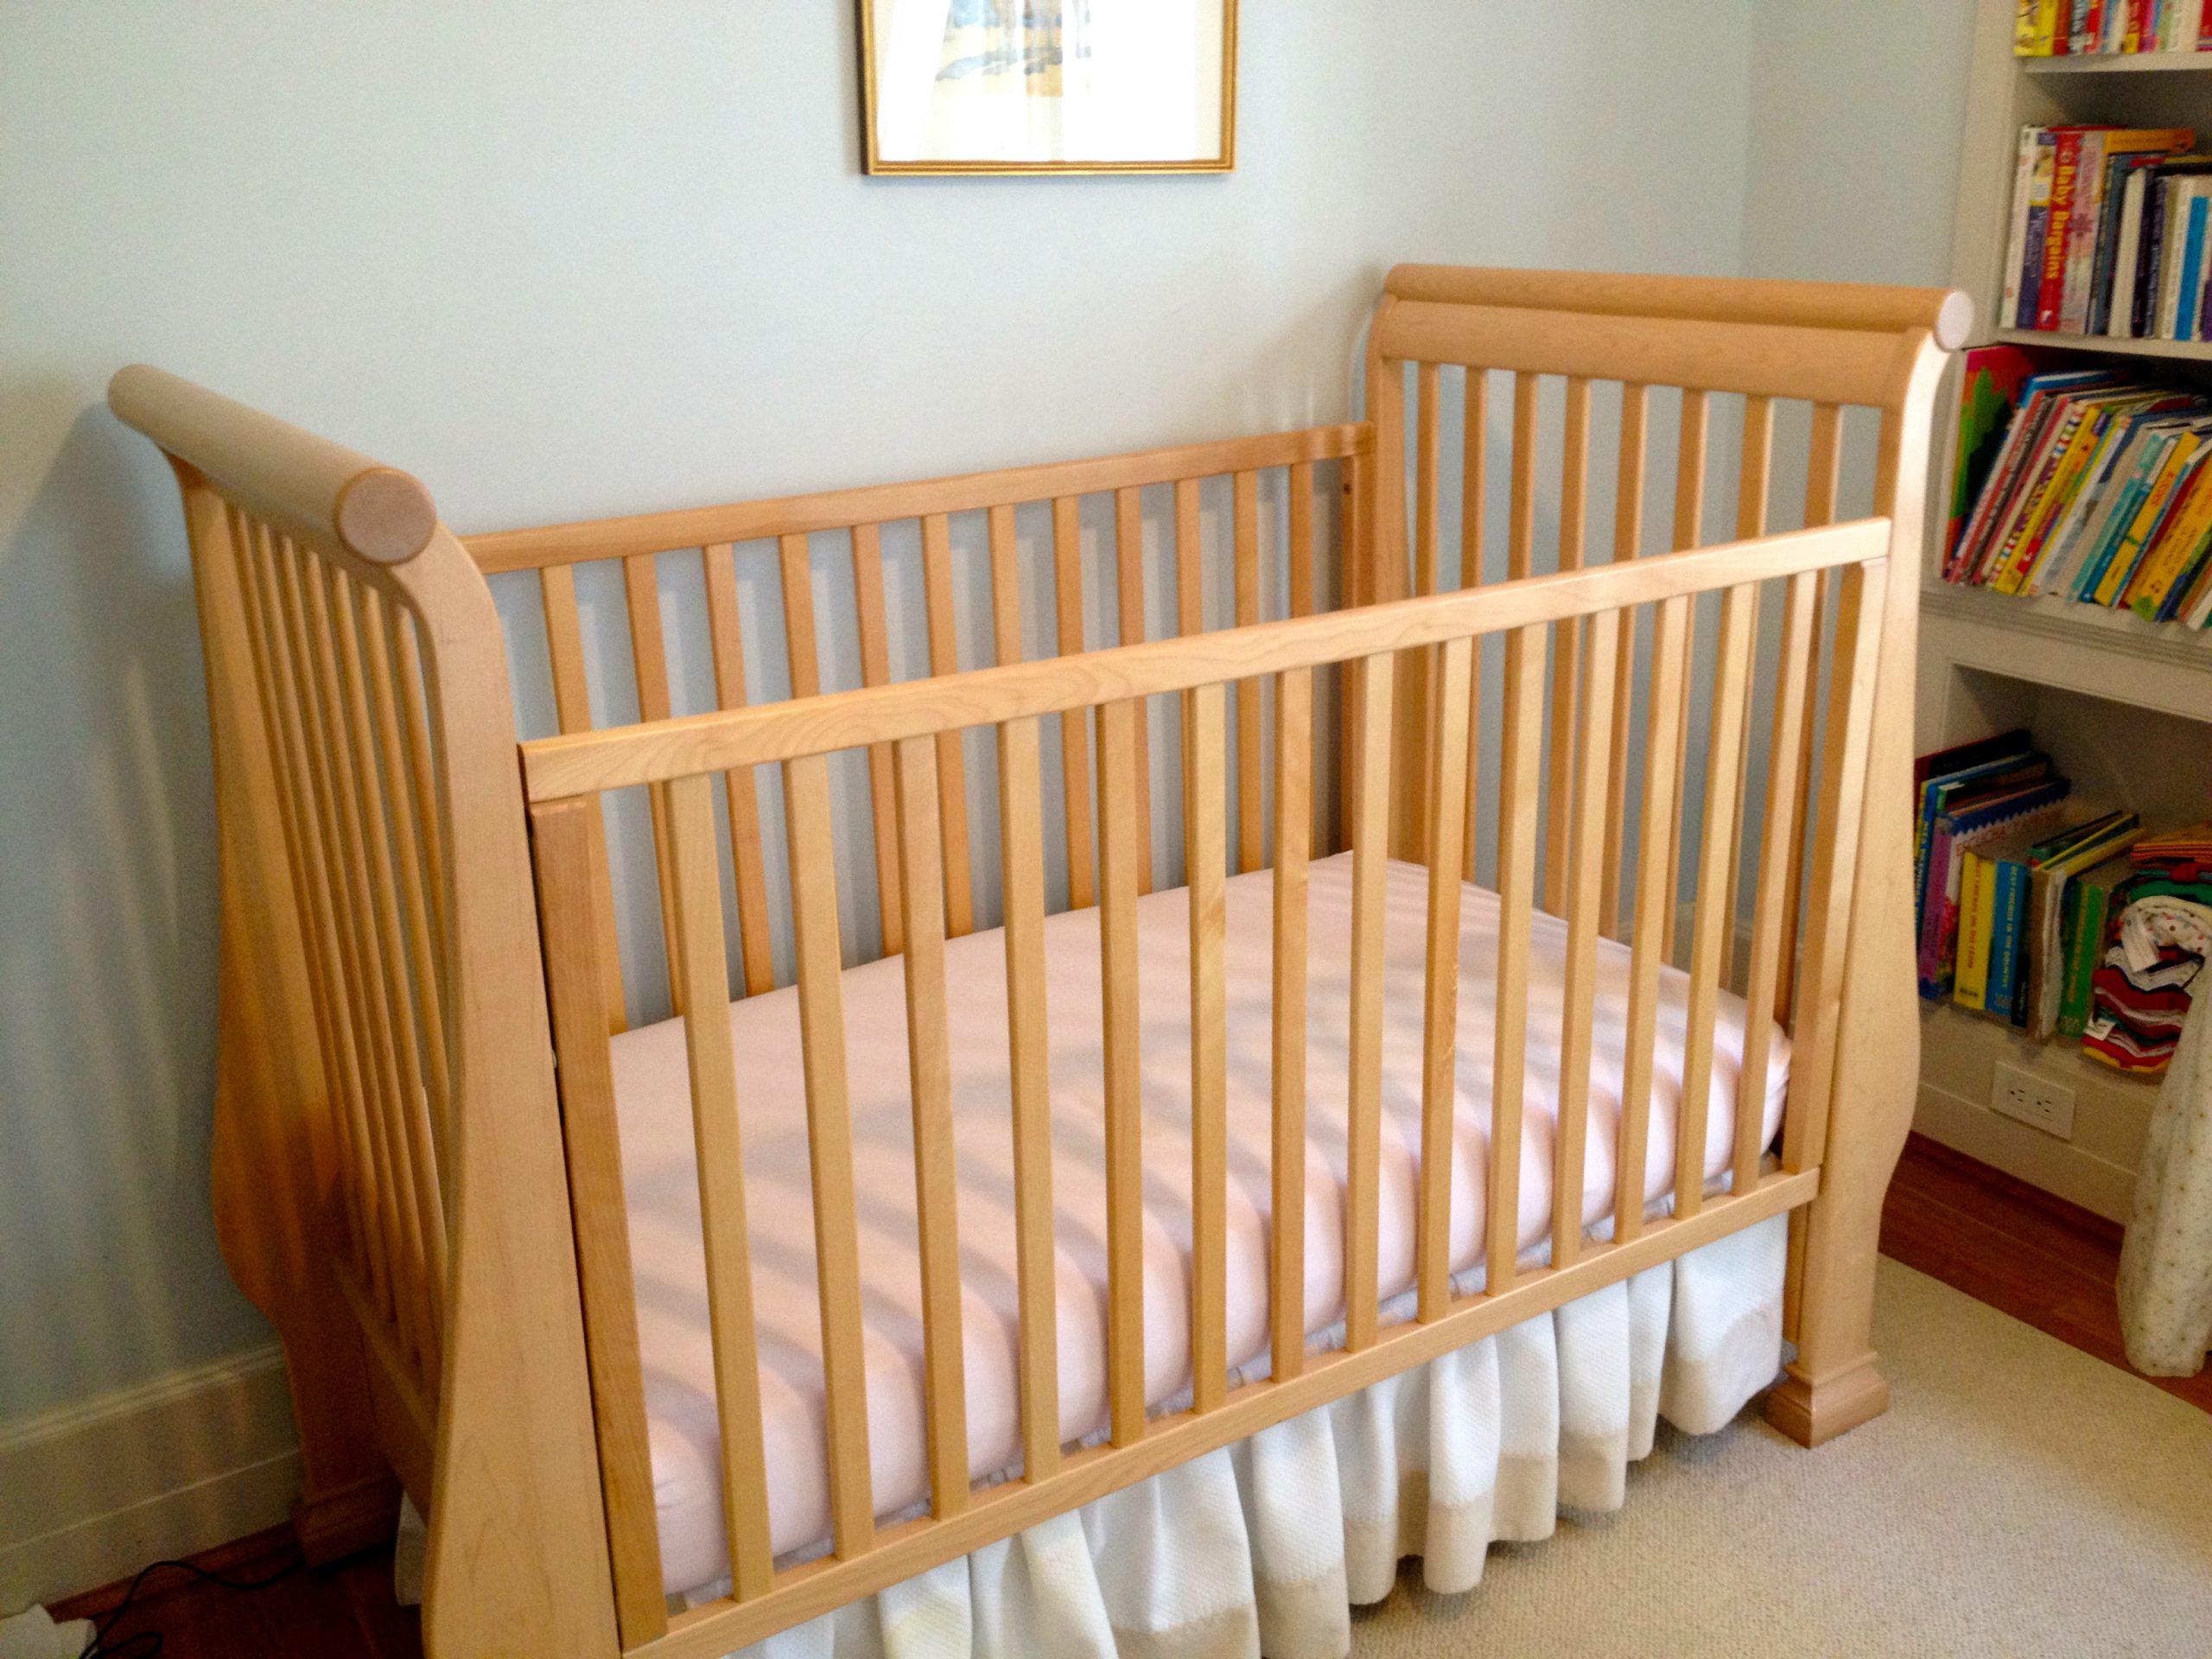 5 Ways Mayer's Nursery Won't Be Like Mine